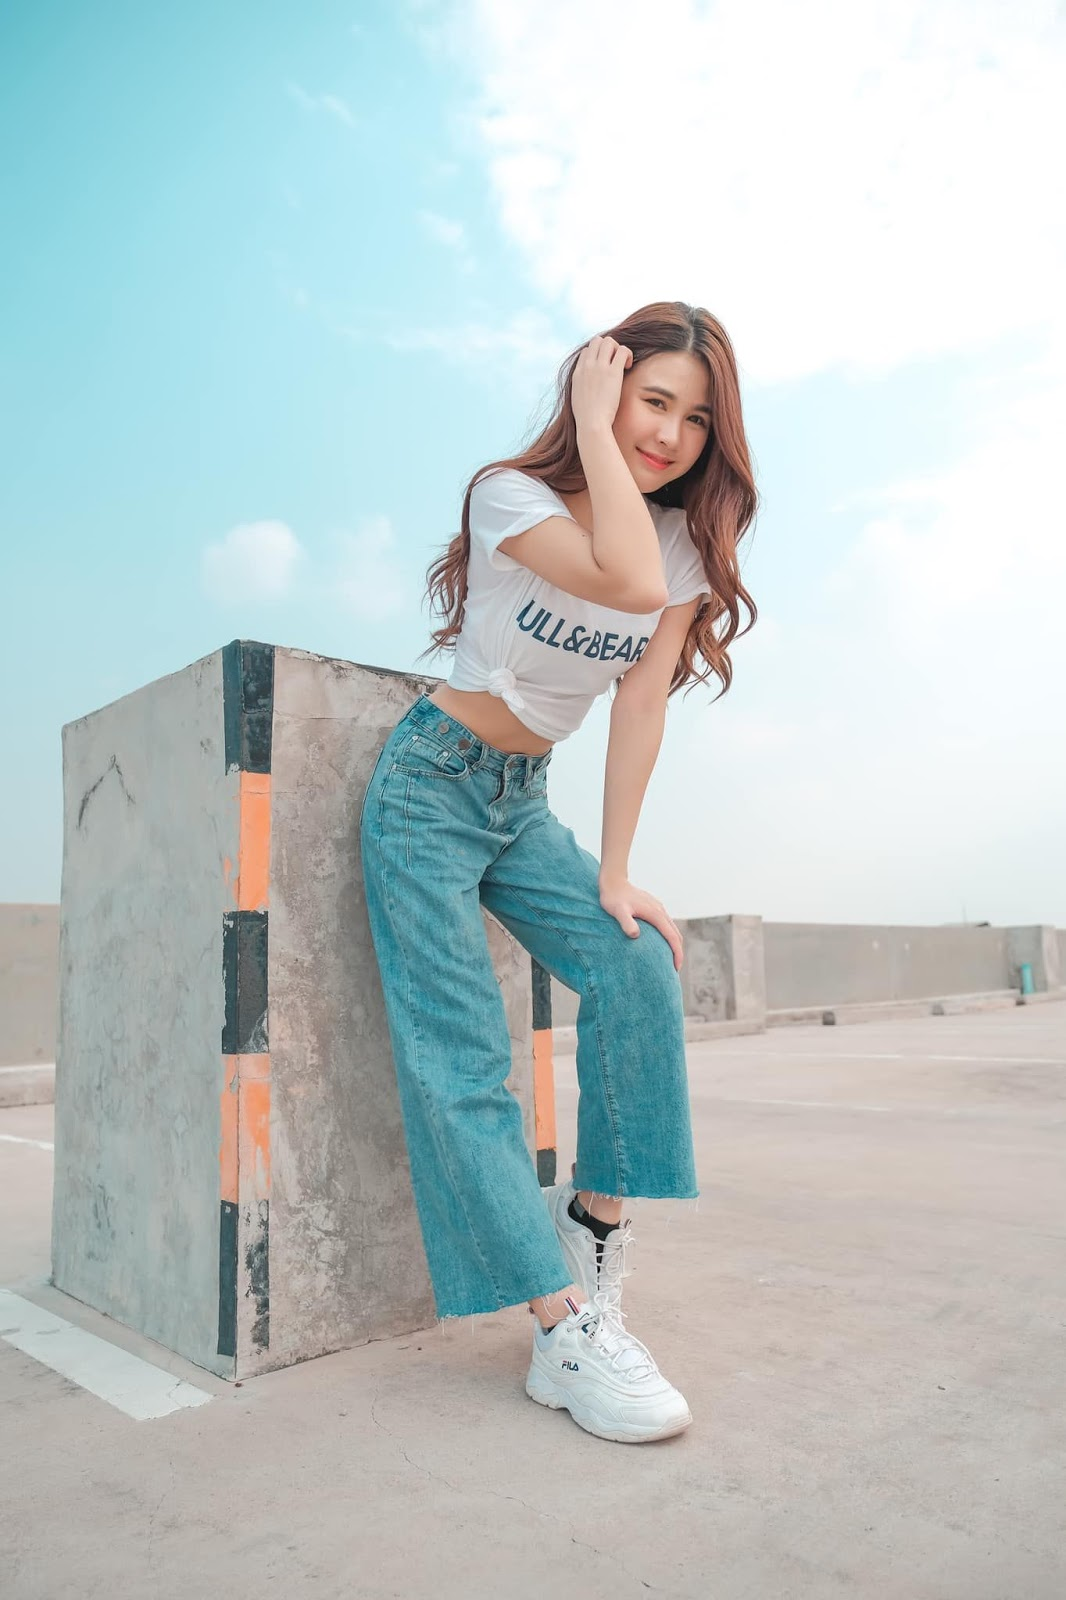 Thailan cute model - Supansa Yoopradit (Lorpor) - The terrace is full of windy afternoon - Picture 2